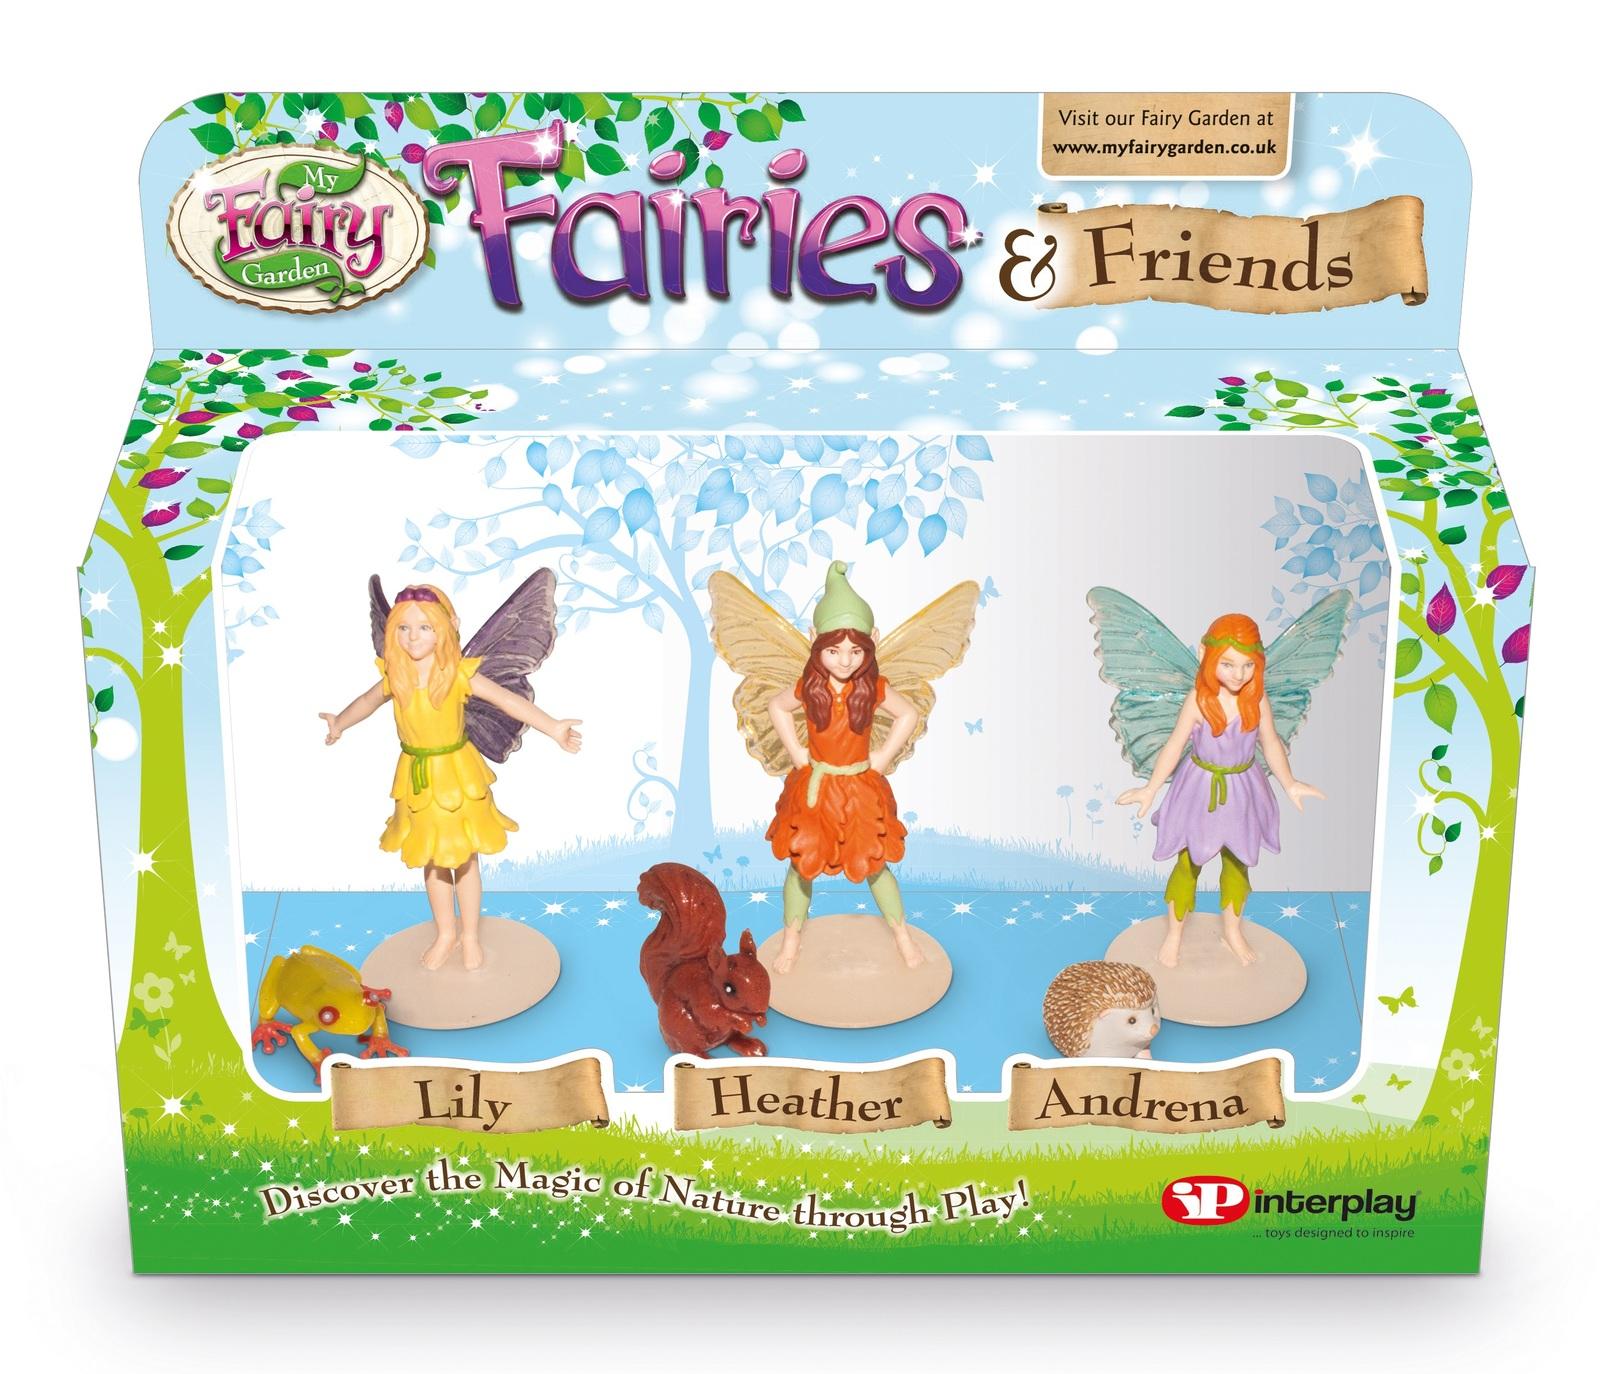 My Fairy Garden & Friends - 3-Pack image